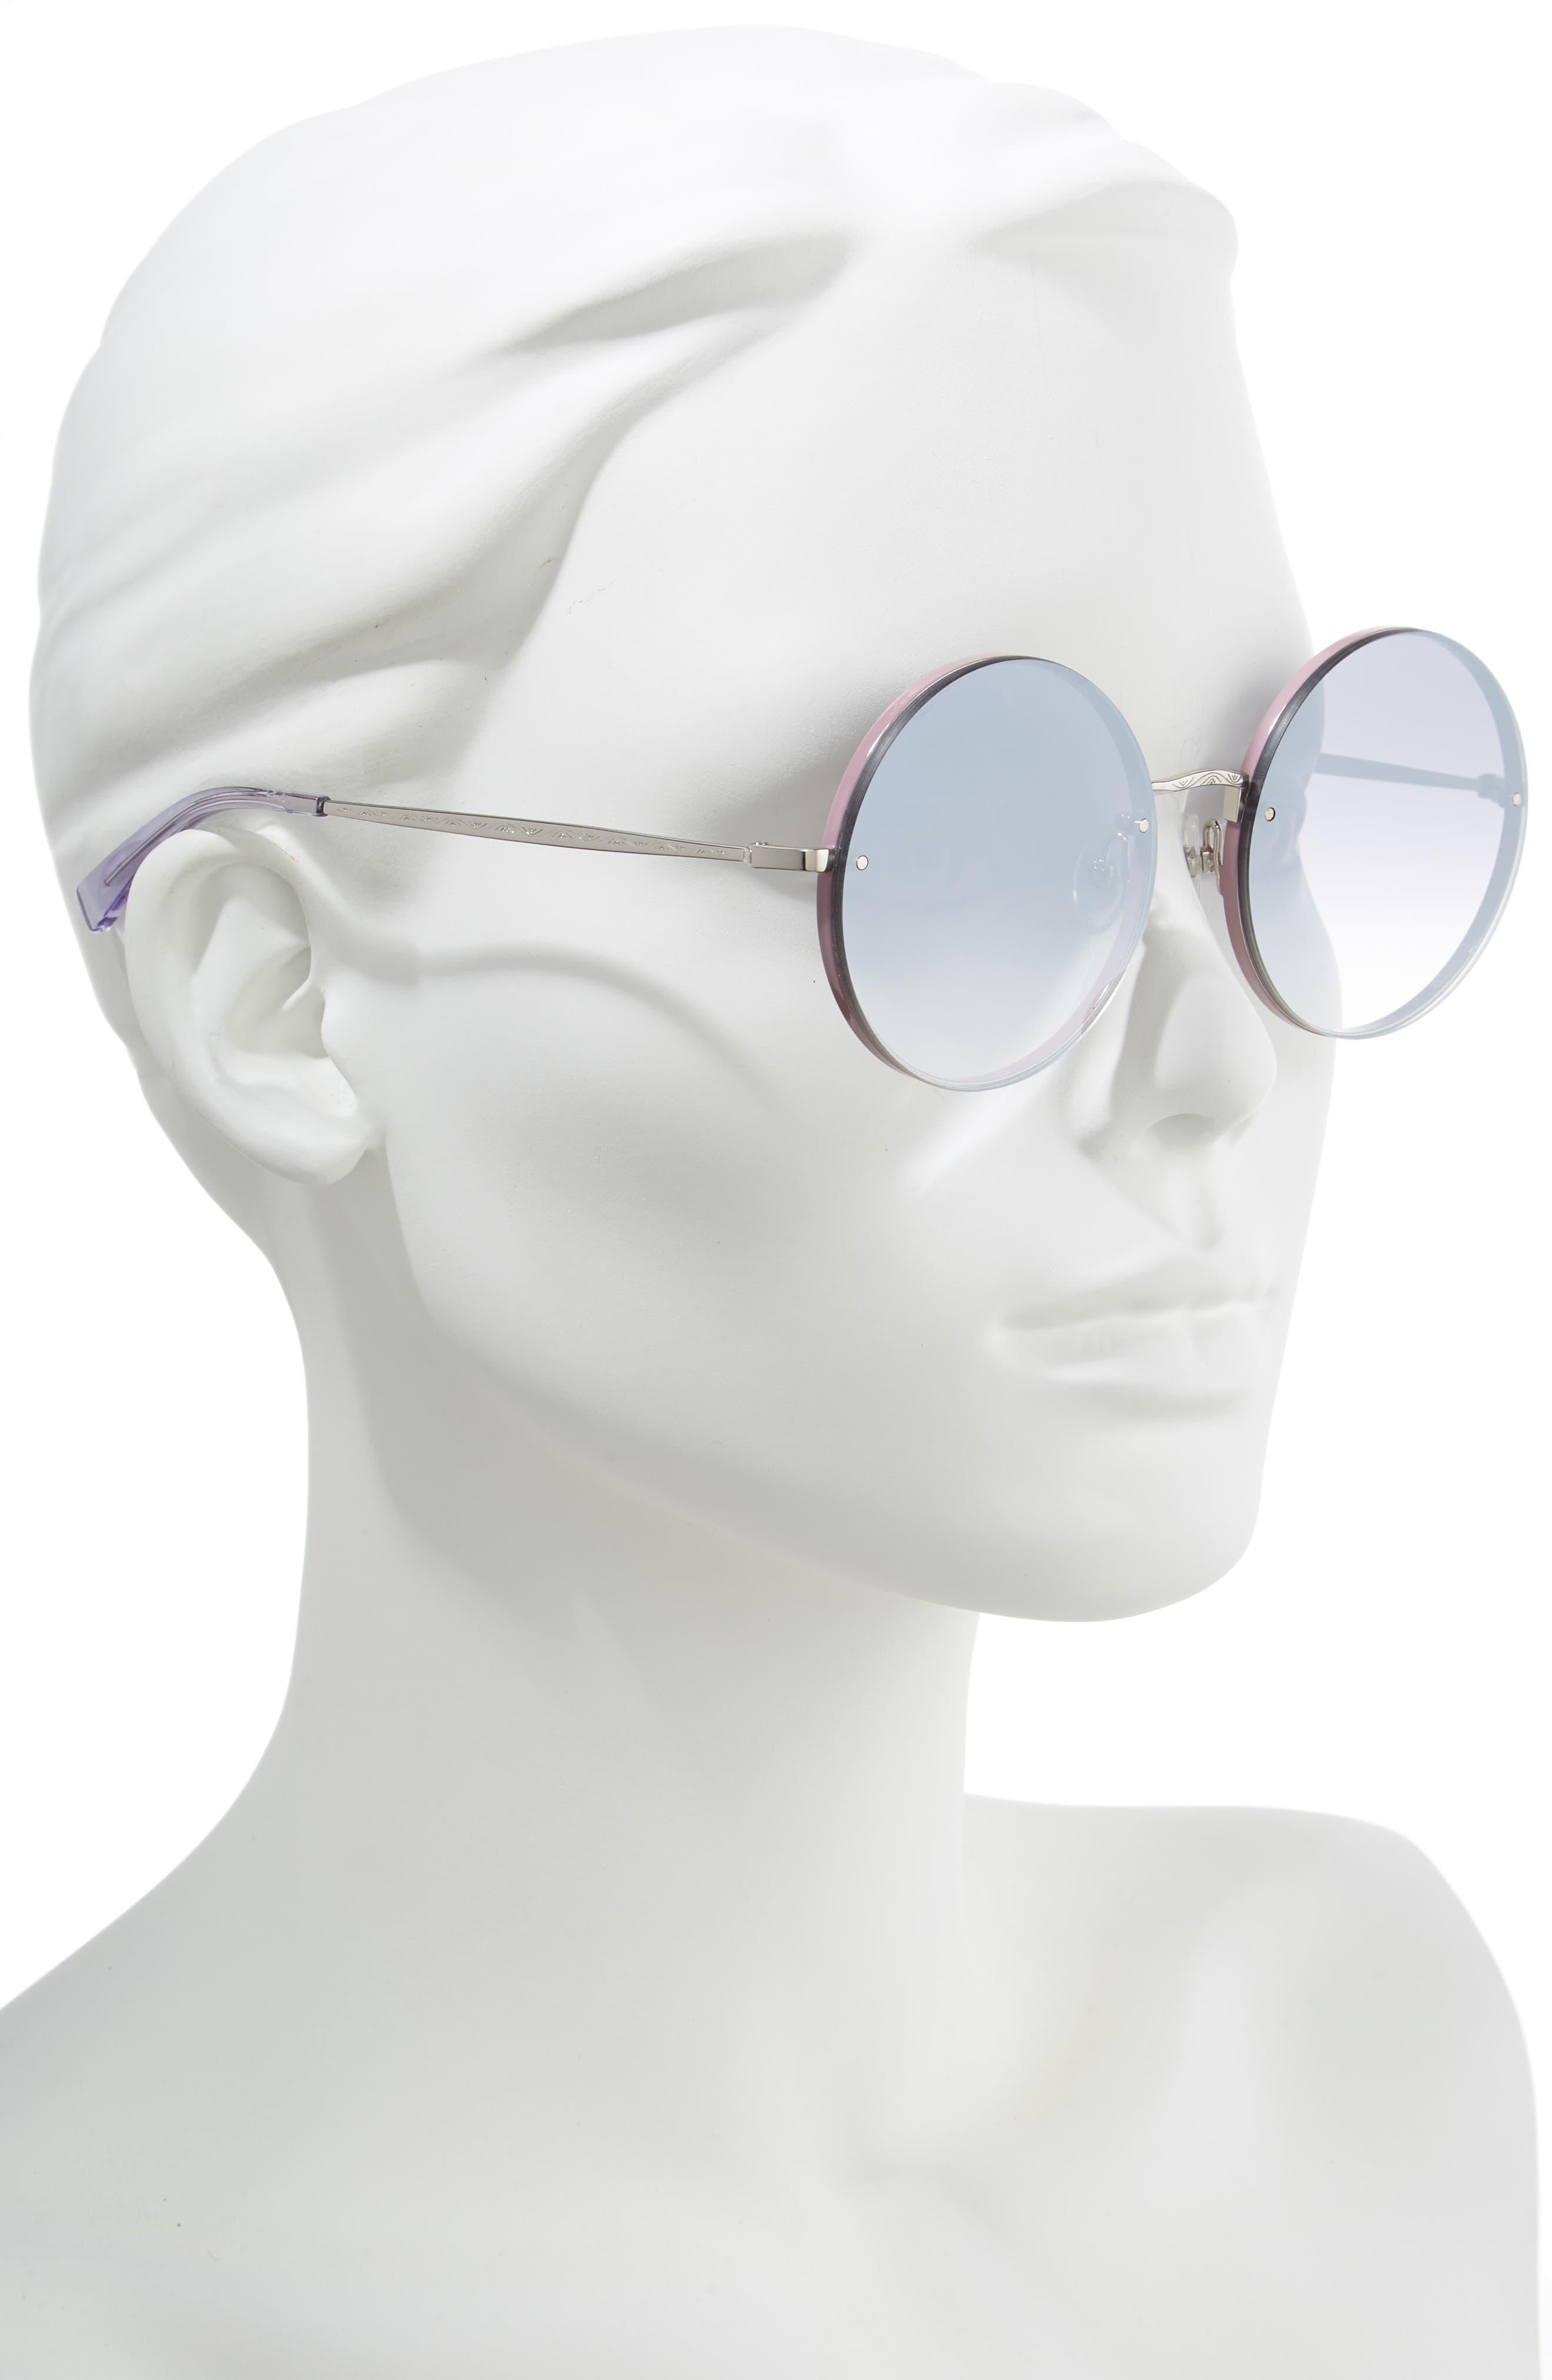 36f6969b211 Rebecca Minkoff Sunglasses for Women